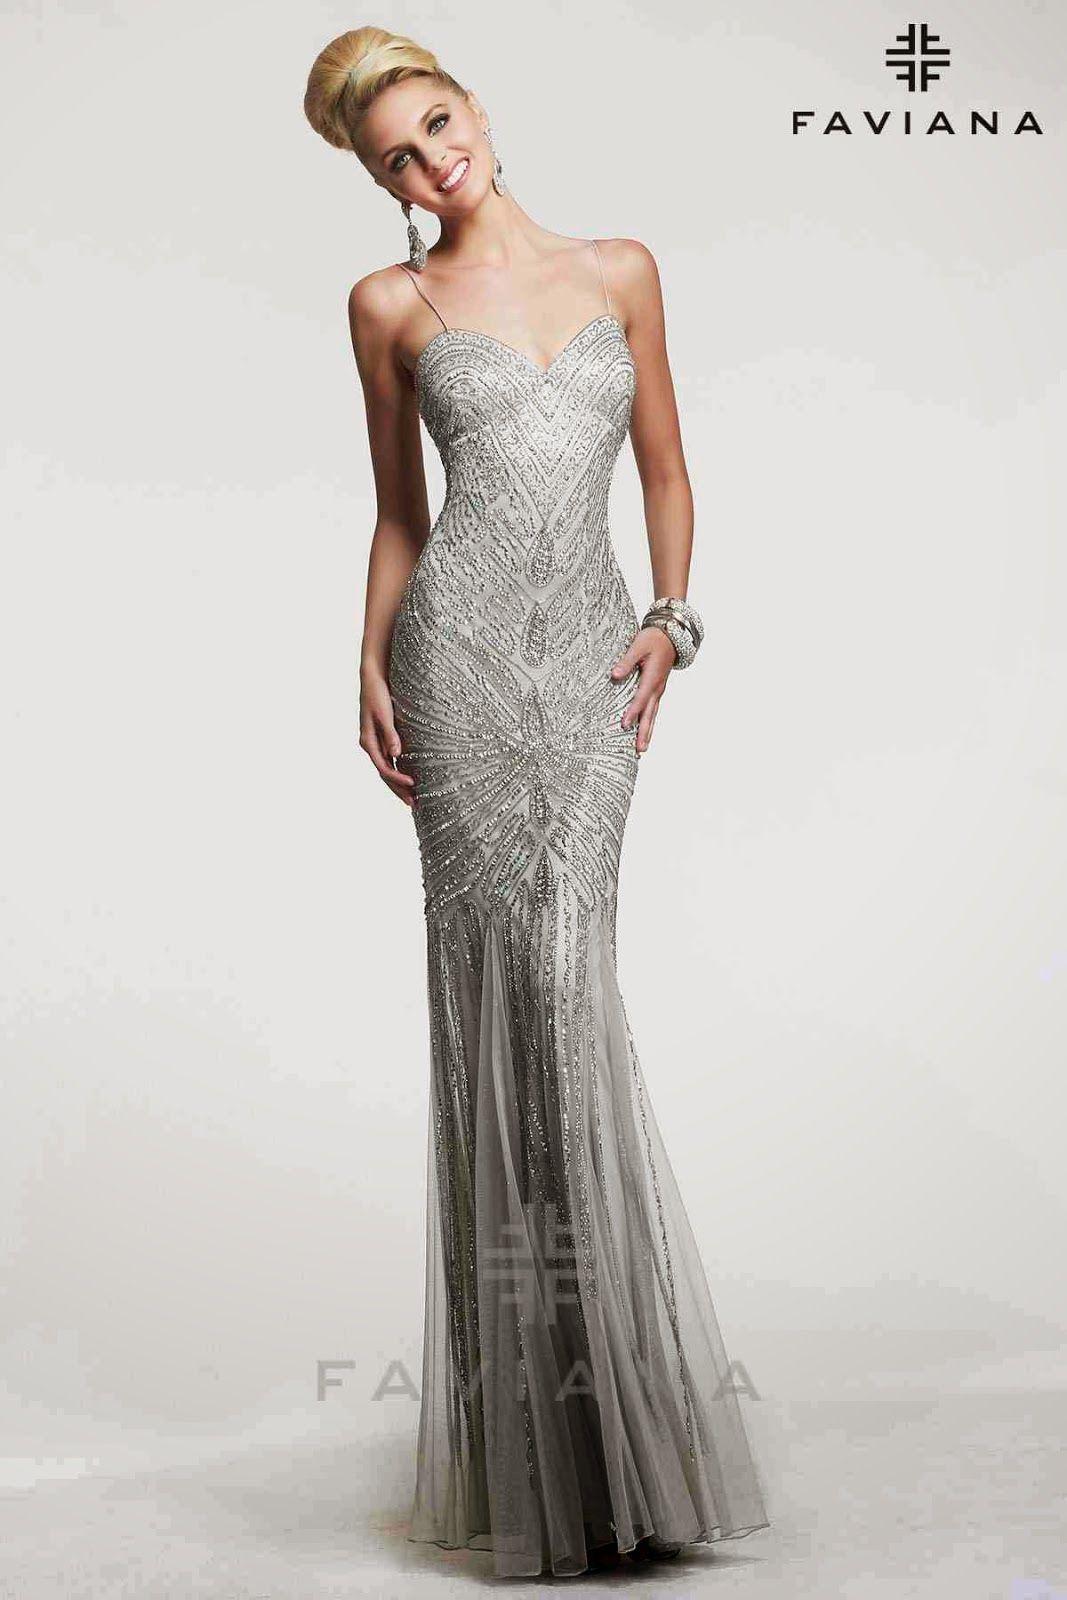 Modas de vestidos para fiestas elegantes